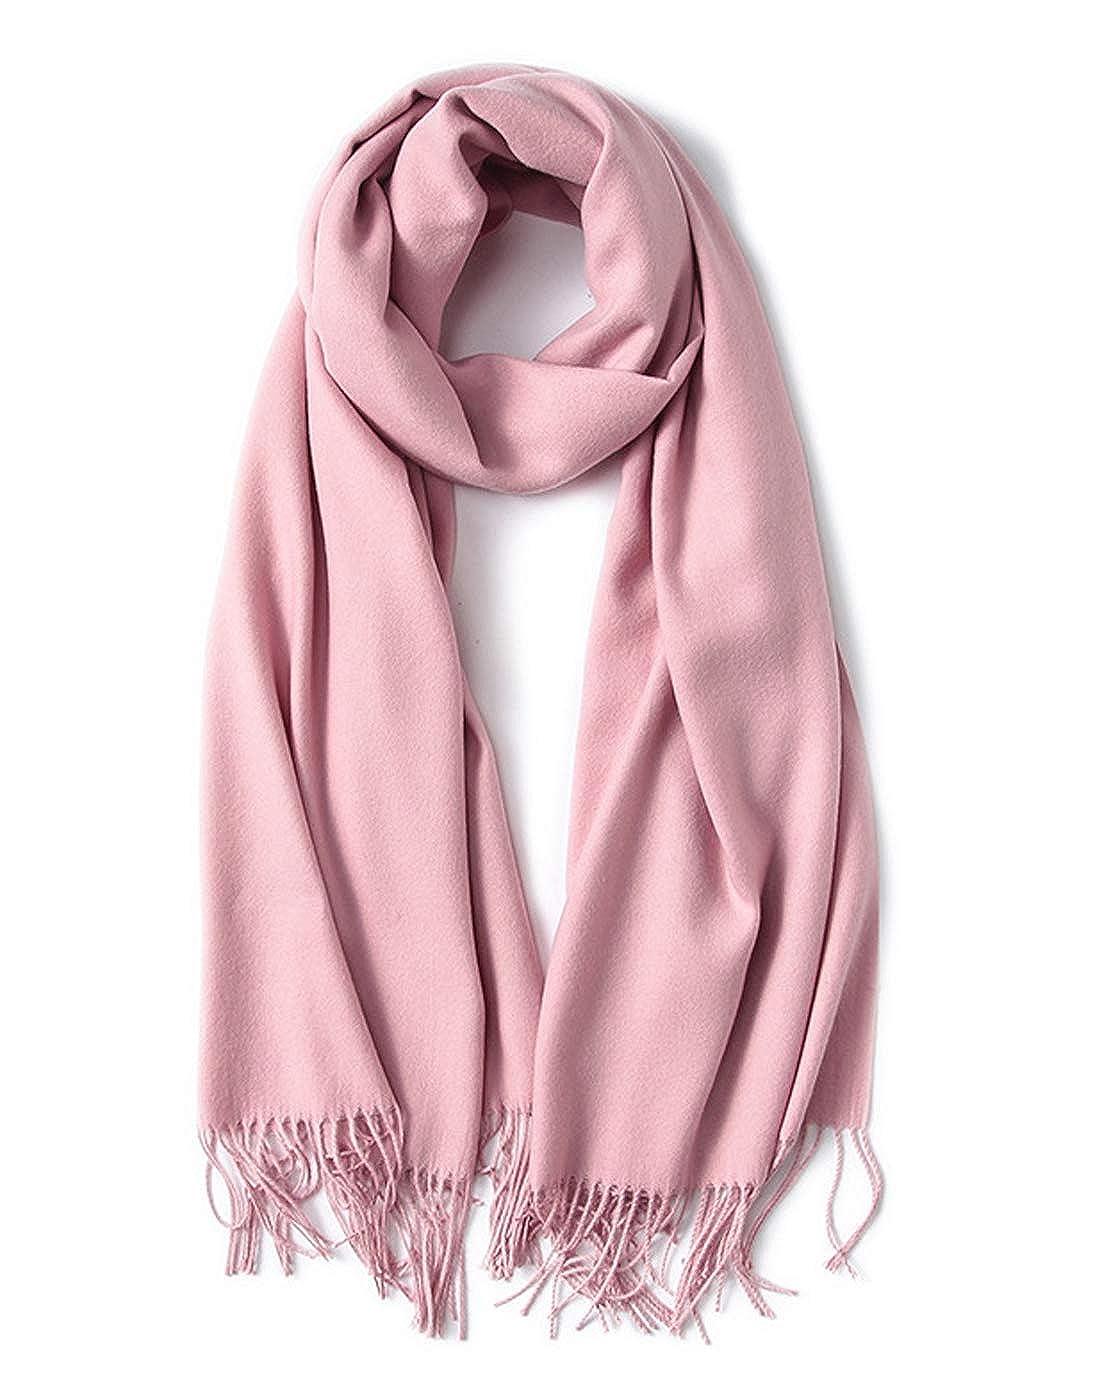 LARRONKETY Women's Large Soft Feel Pashmina Blankets Shawls Wraps Tassel Warm Winter Scarf Solid Colors TOWJ00201C20